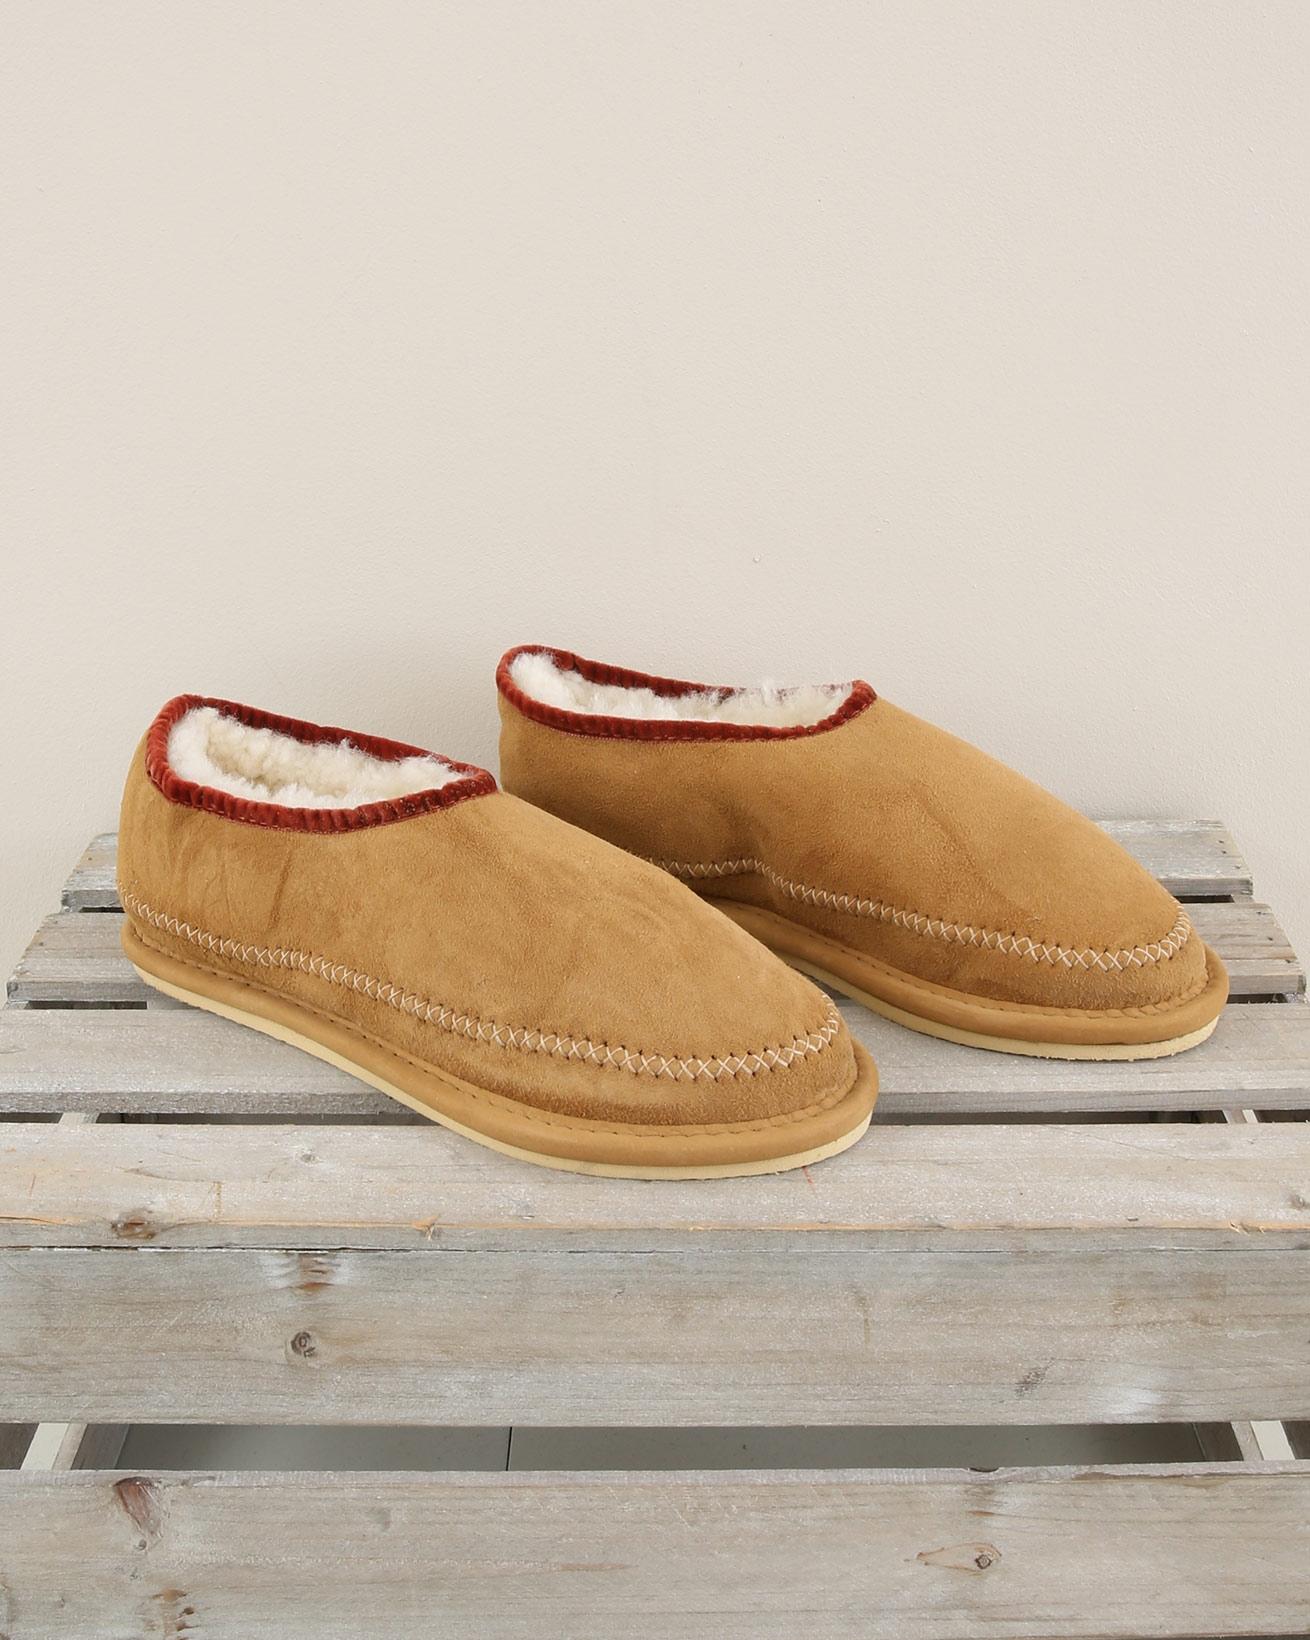 Moccasin slipper with velvet binding - Size 6 - Spice - 1978